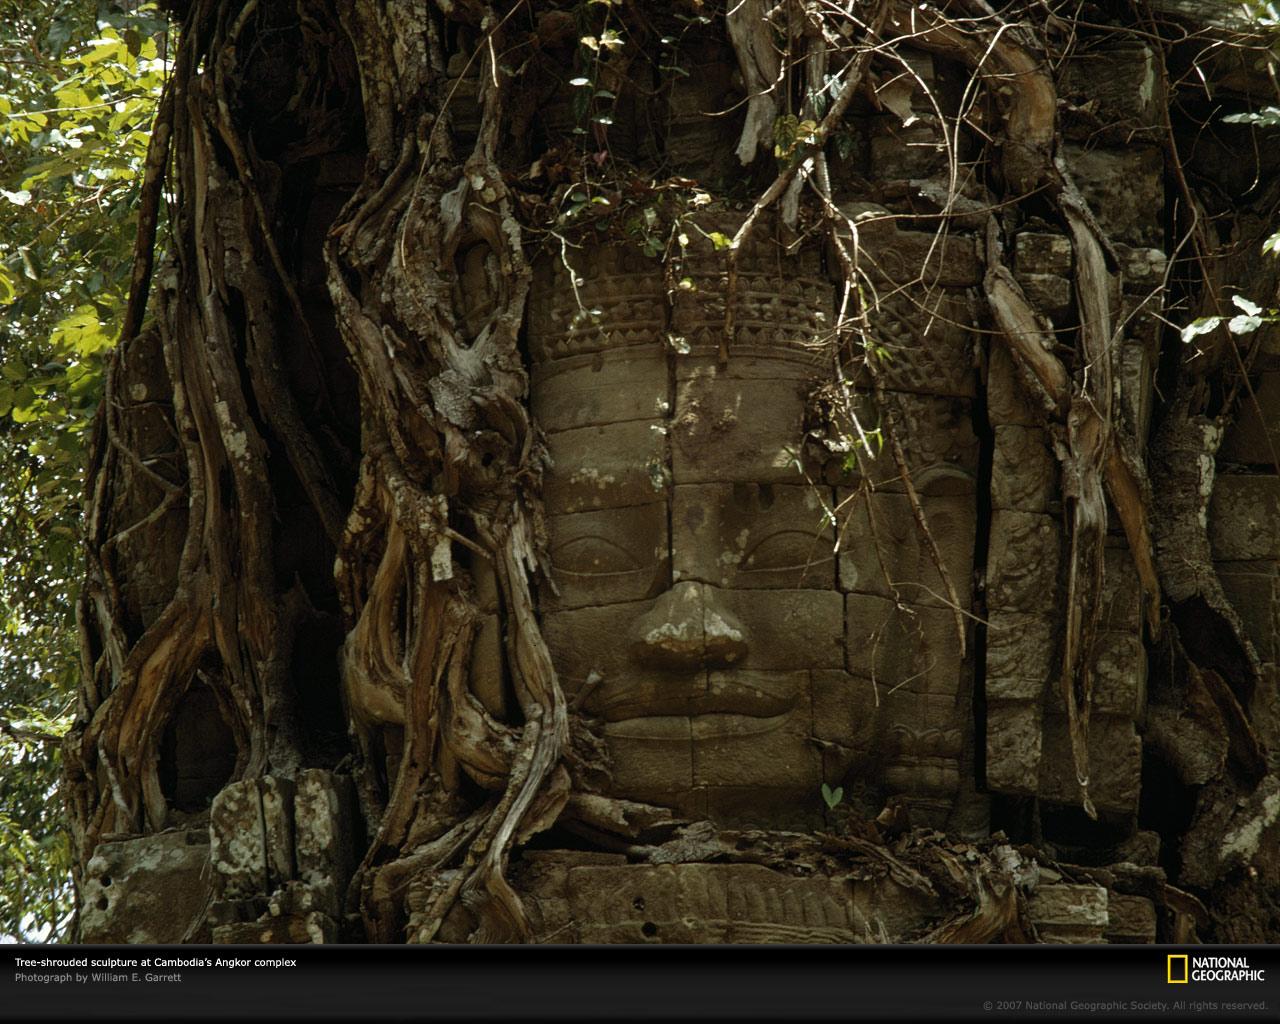 http://1.bp.blogspot.com/-gX7JhWLPQHs/UE3iE0N9zaI/AAAAAAAAI7k/1WylYG0oHEk/s1600/tree-shrouded-sculpture.jpg